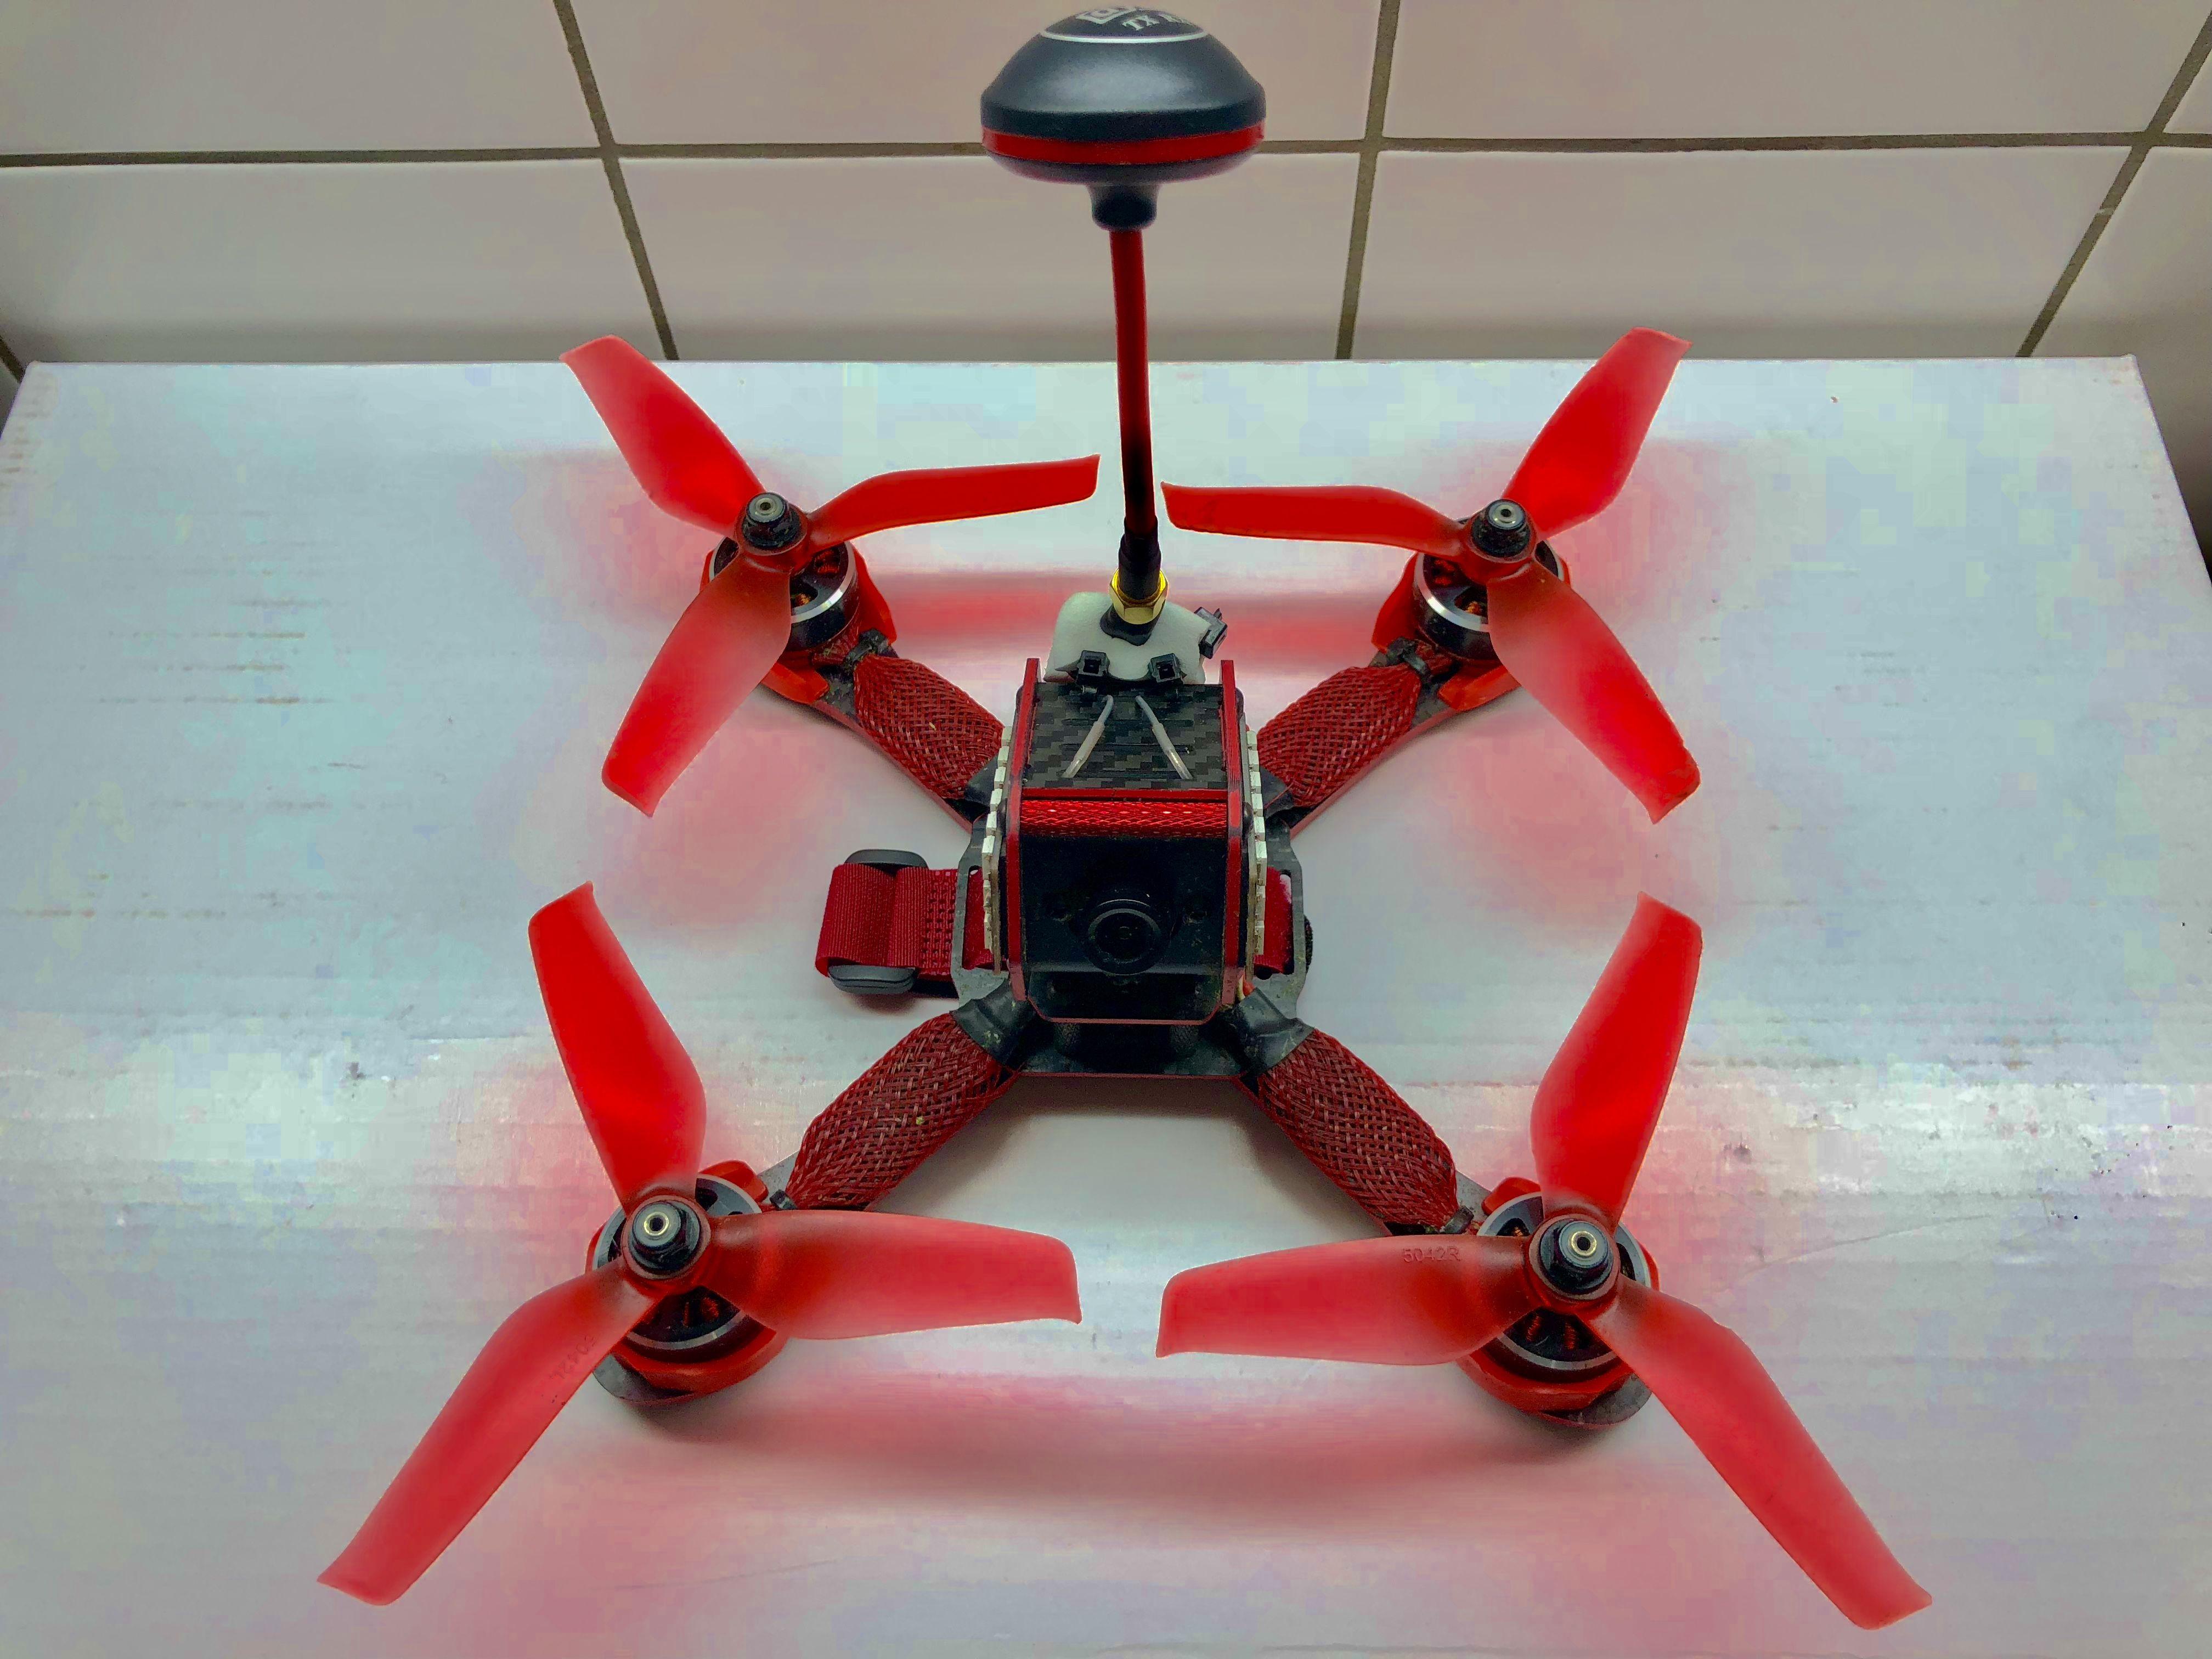 vente de drone pas cher